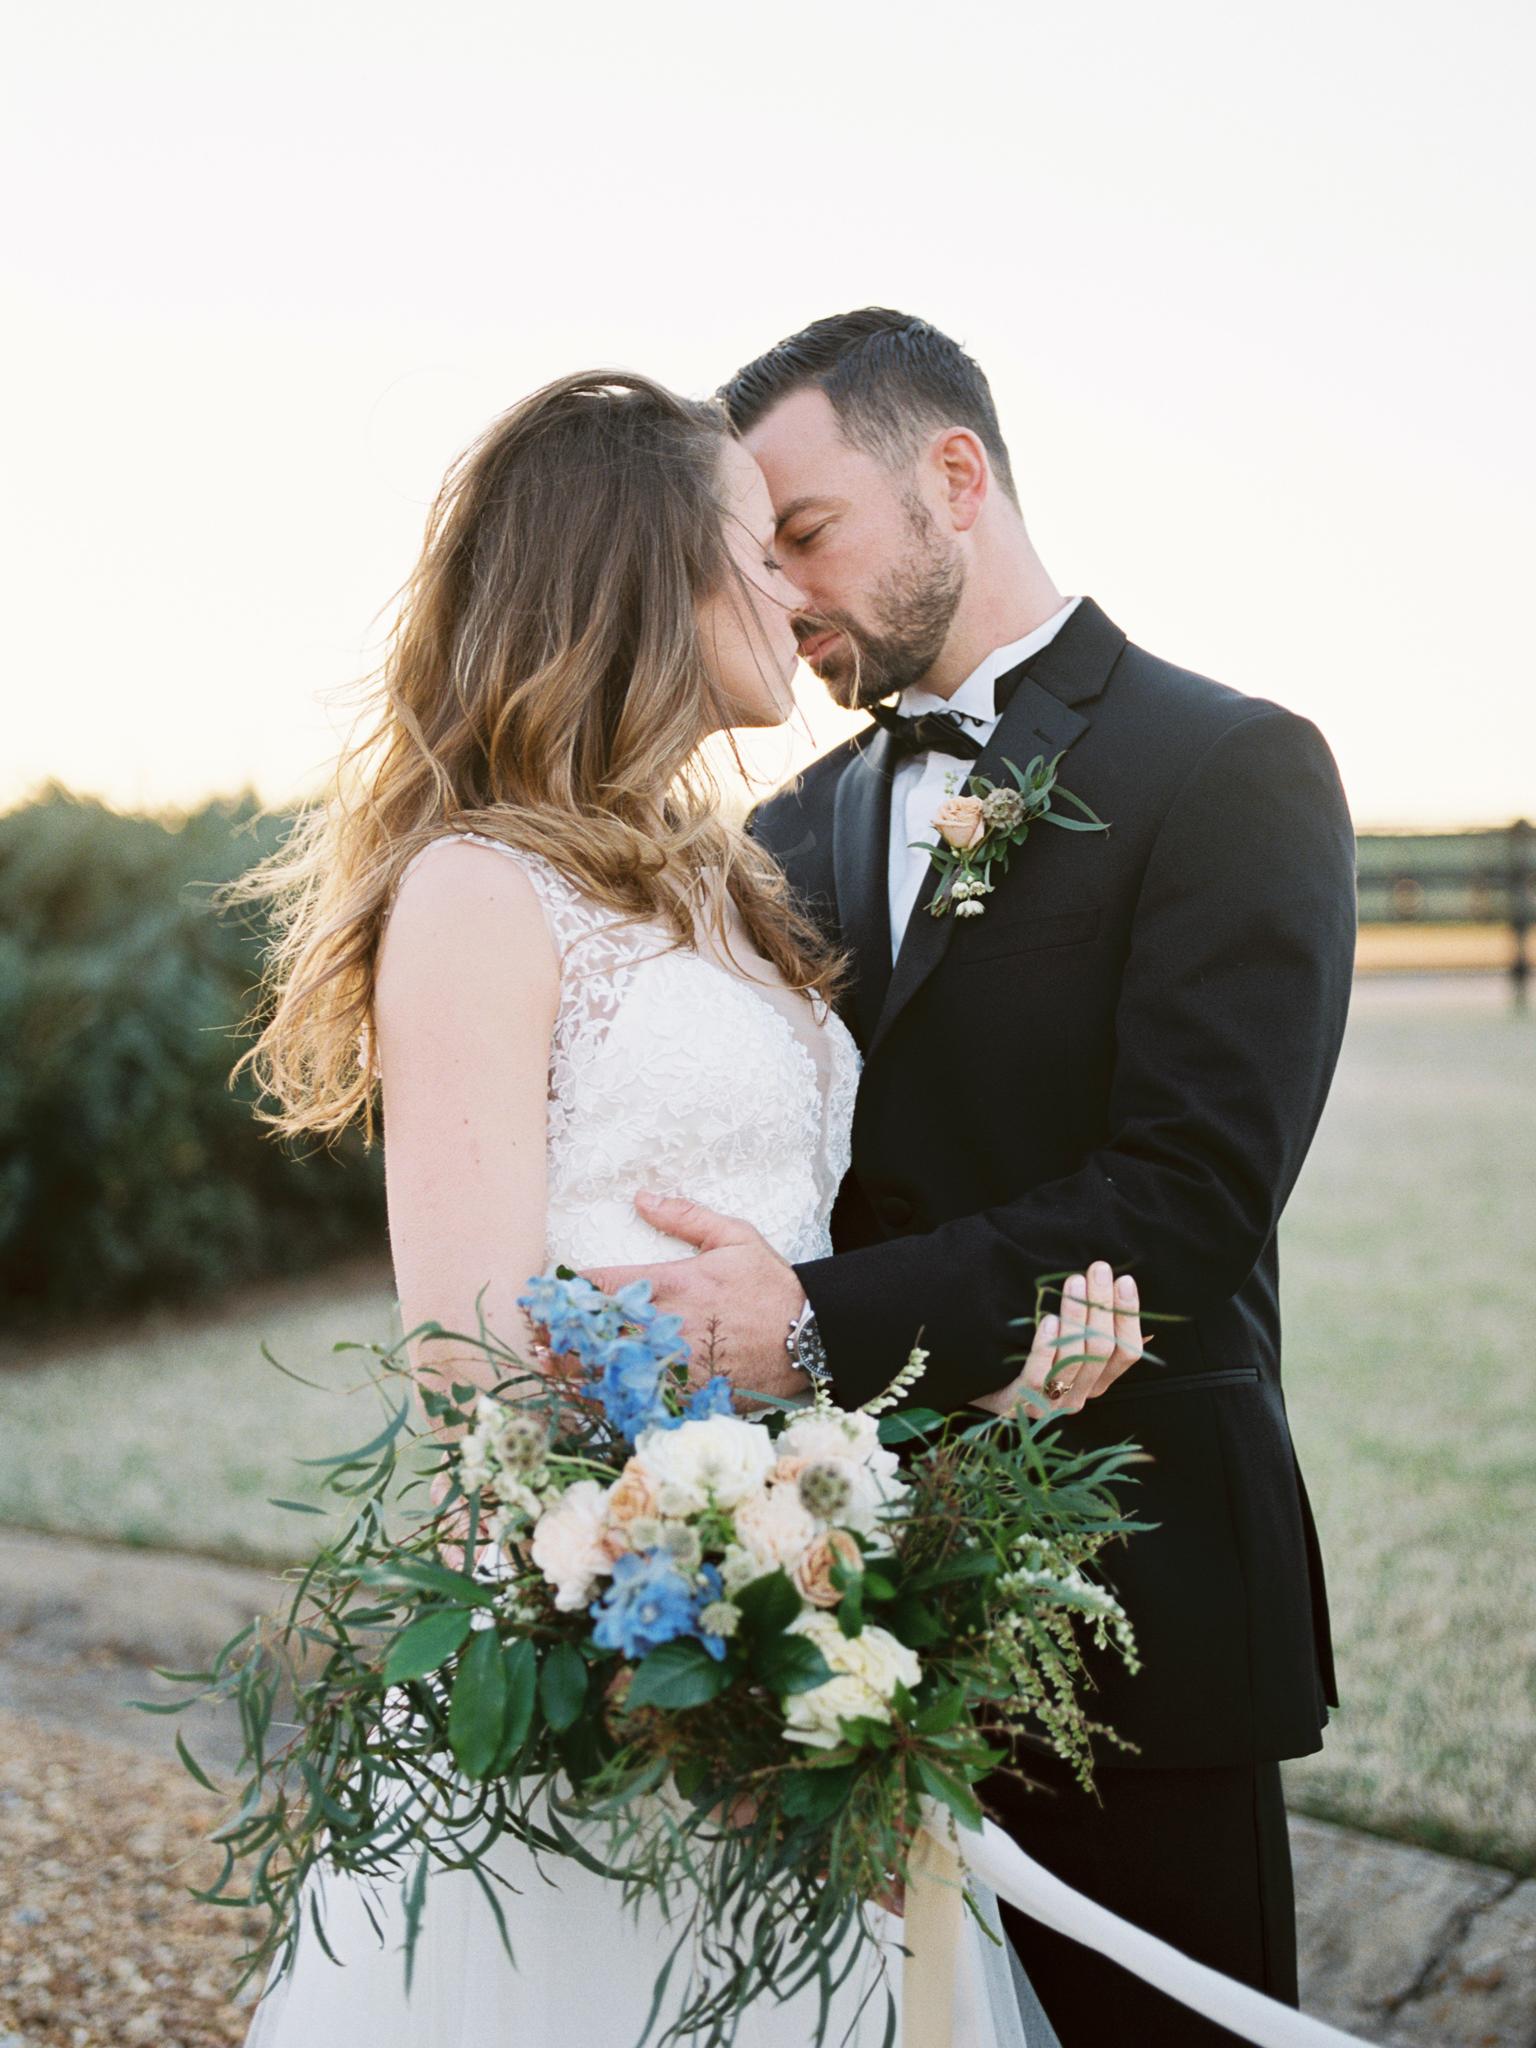 christinadavis+weddinginspiration51.jpg